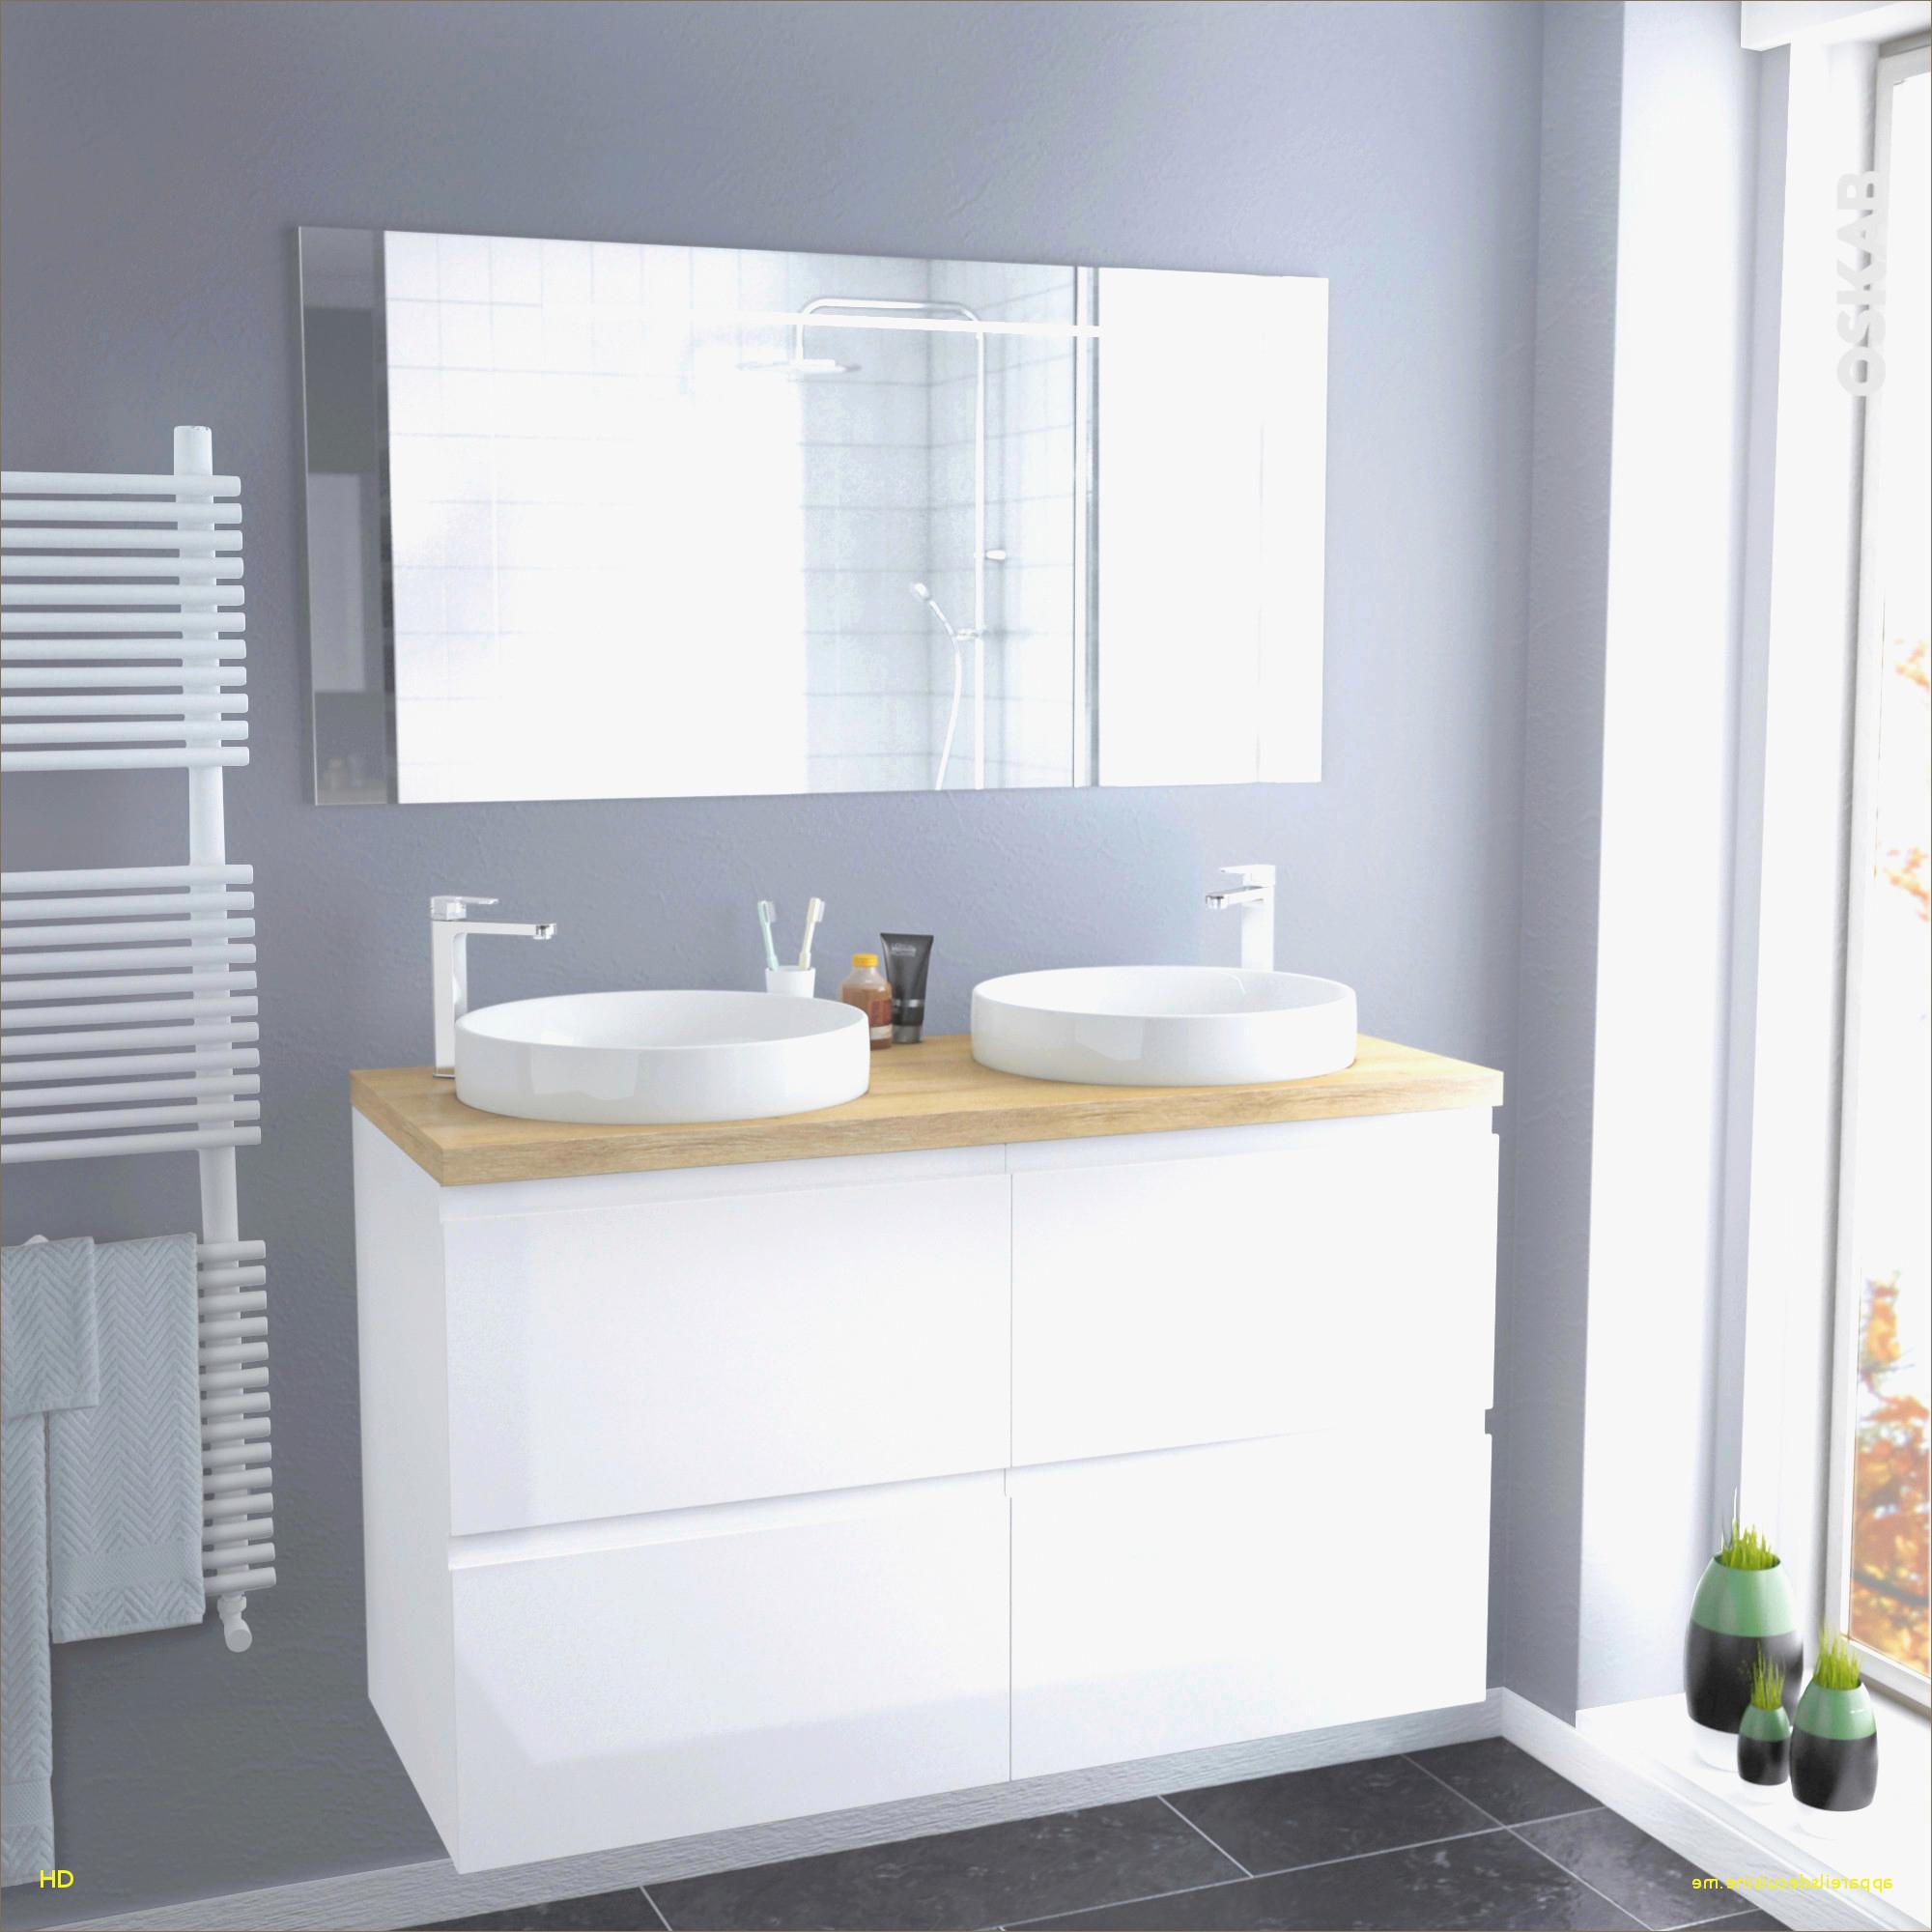 panneau mural salle de bain castorama l gant images panneau mural salle de bain brico depot. Black Bedroom Furniture Sets. Home Design Ideas